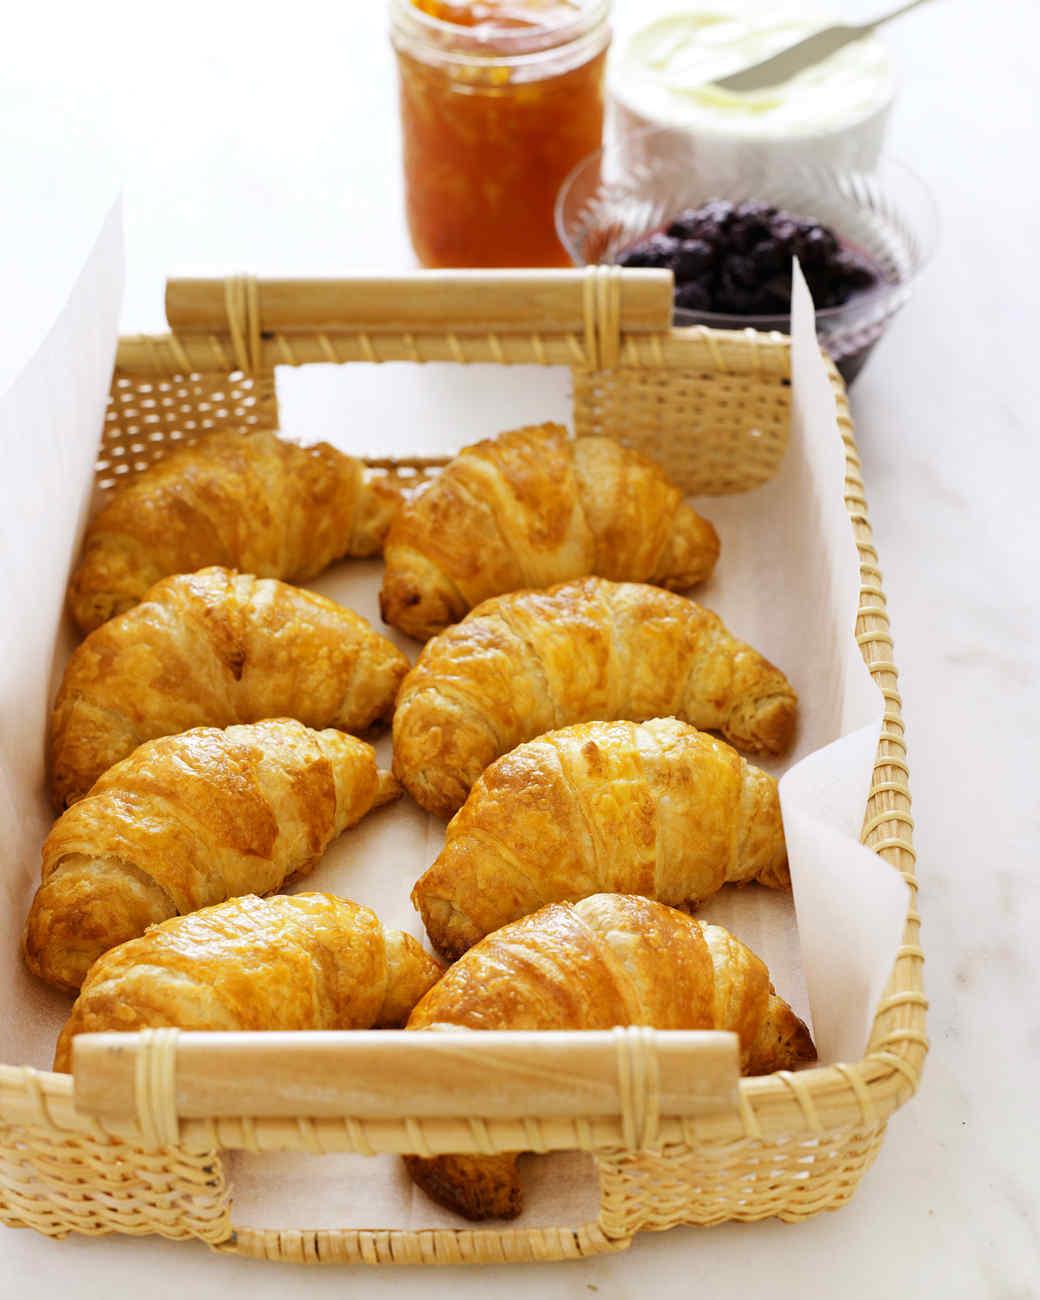 almond-croissants-mblb2006.jpg